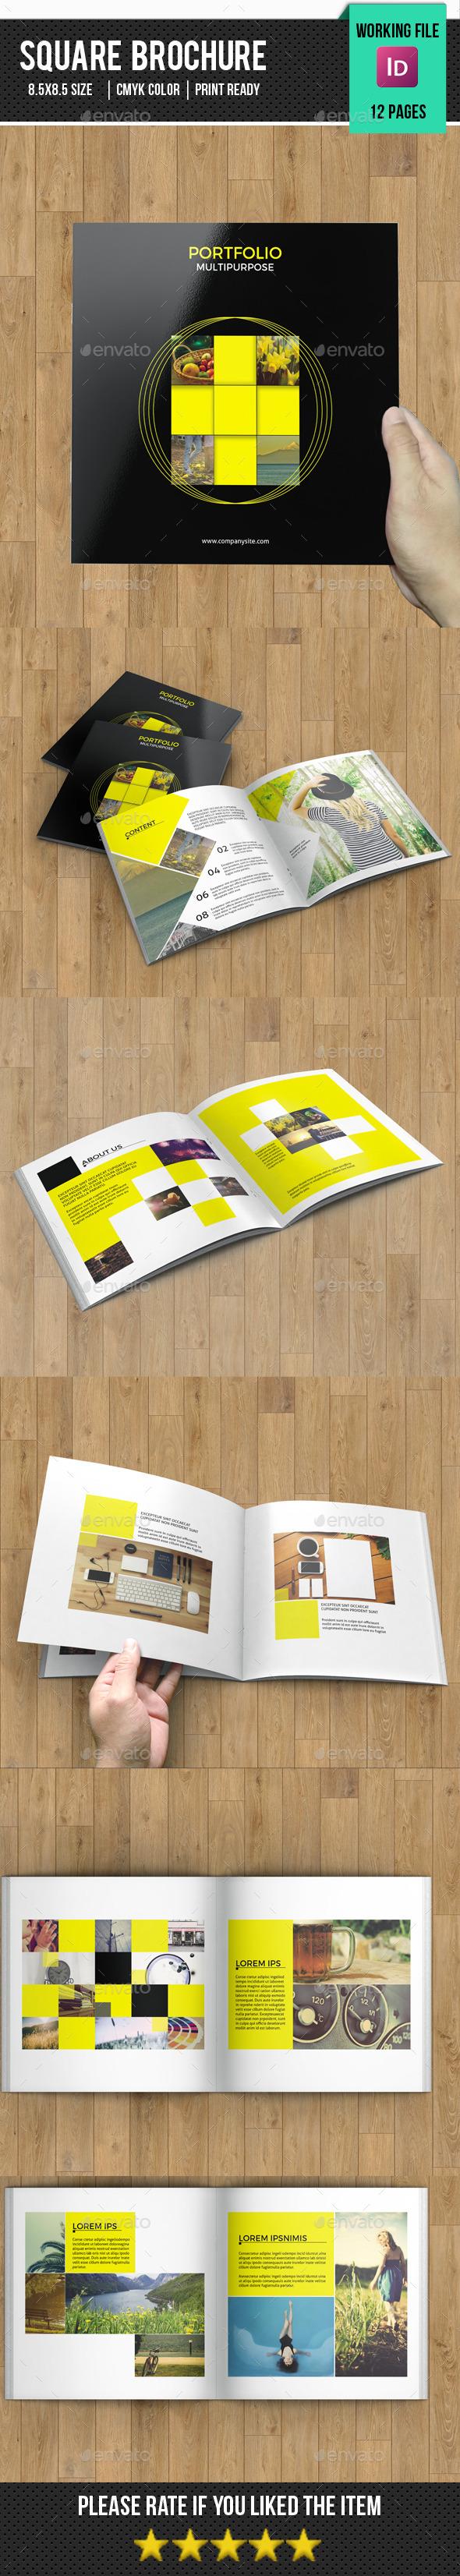 Square Brochure for Portfolio-V71 - Catalogs Brochures